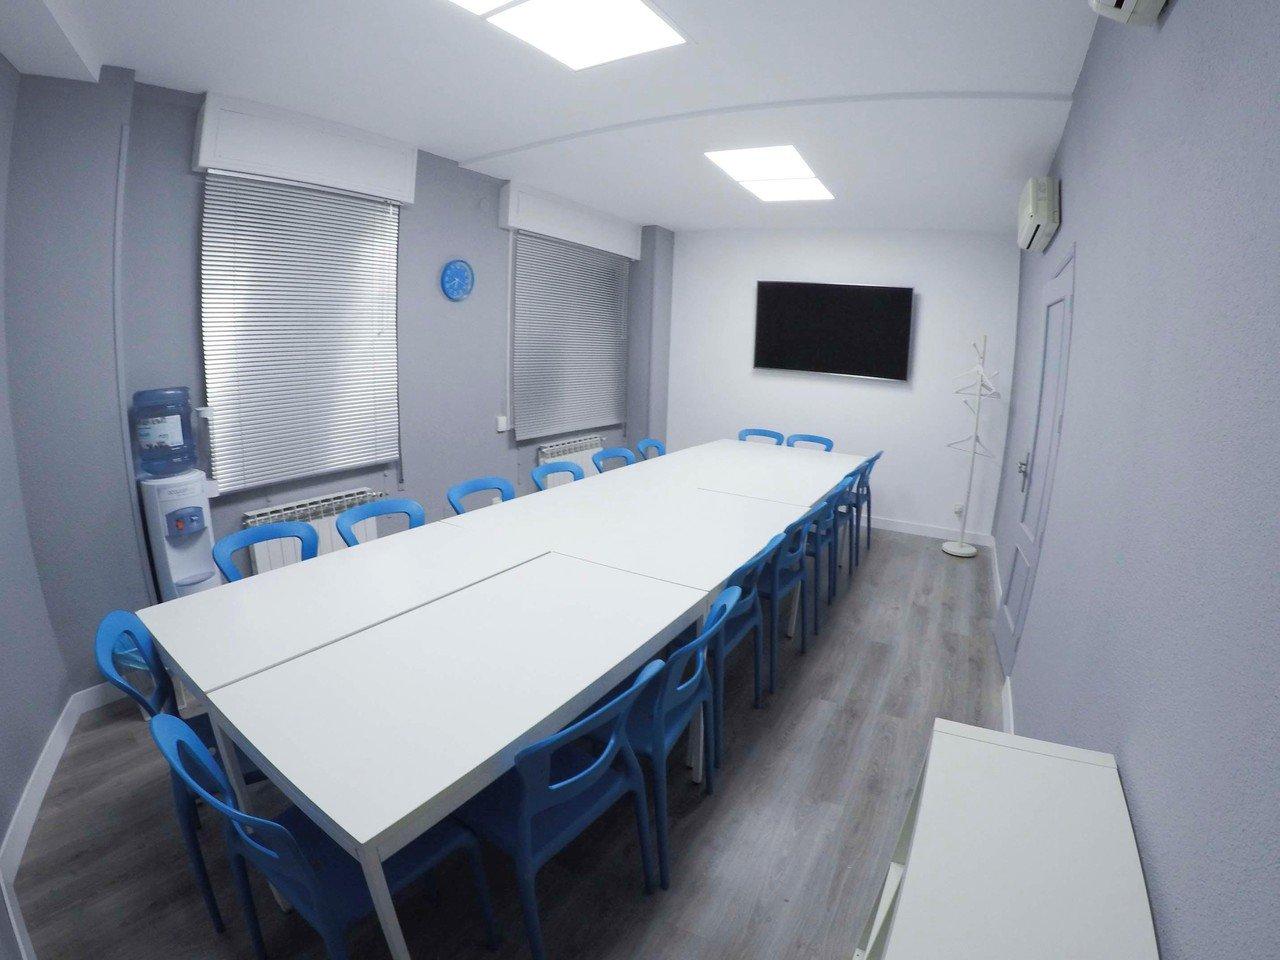 Madrid training rooms Meetingraum N&N Networking Center - Sala Azul image 0